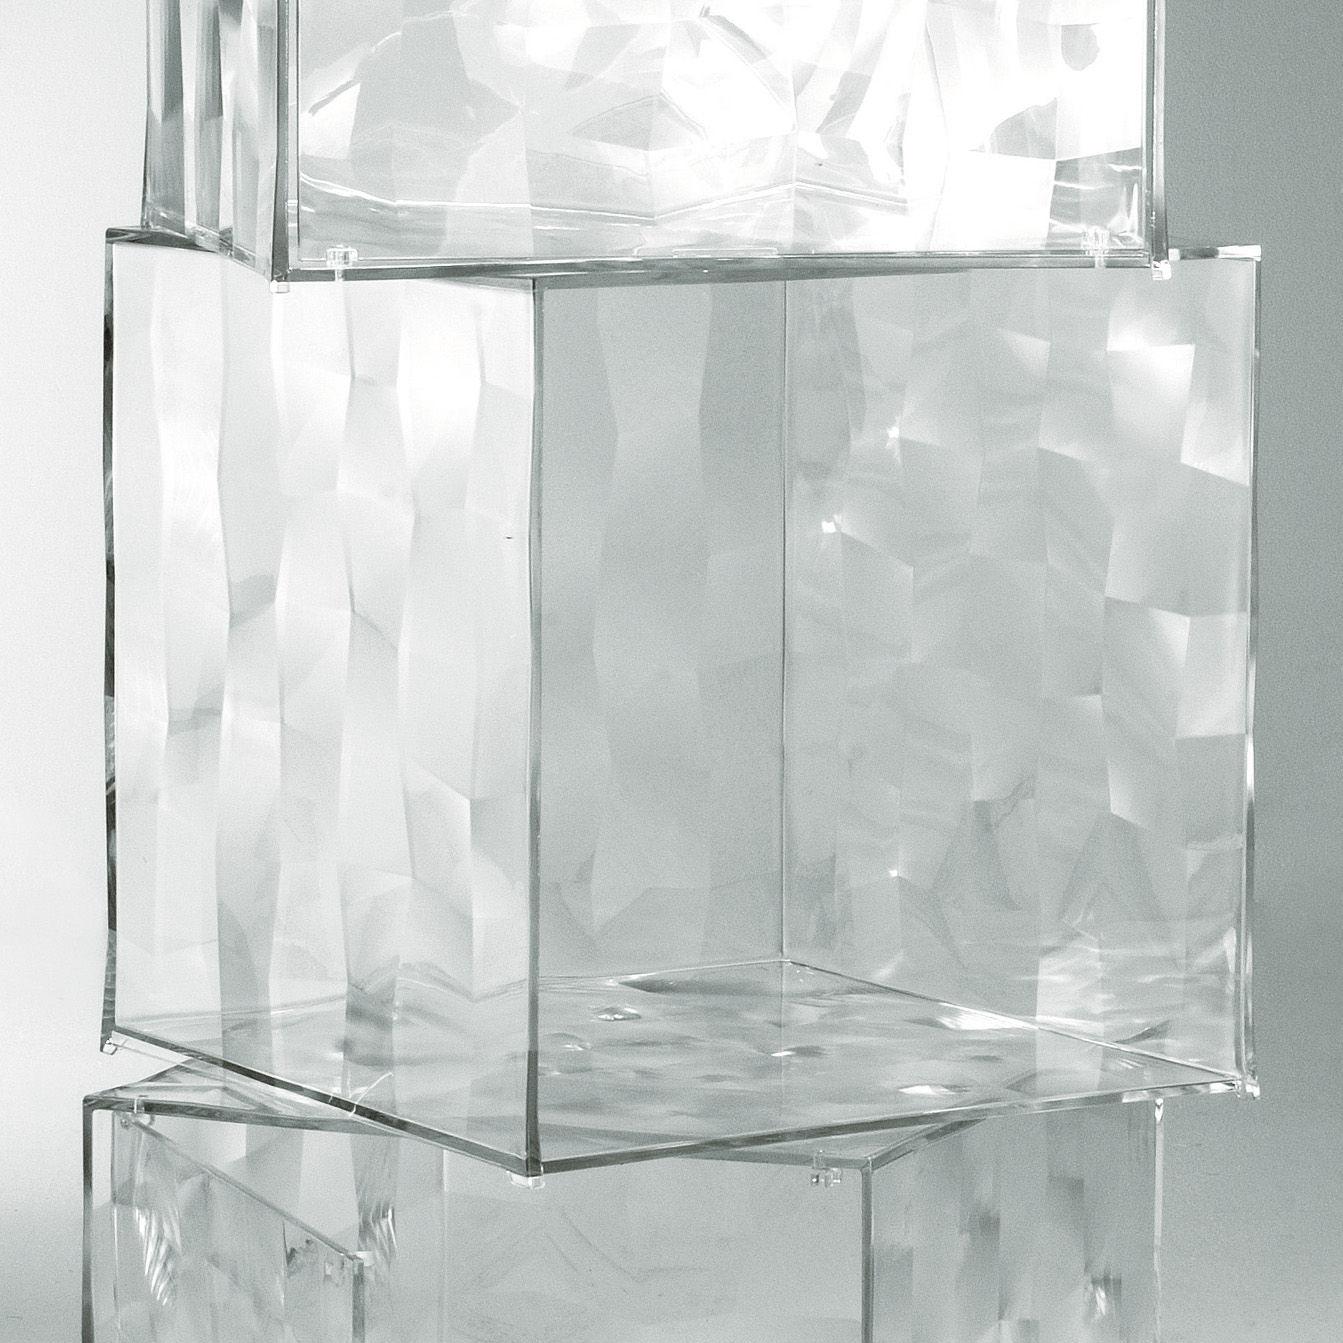 Mobilier - Tables basses - Rangement Optic sans porte - Kartell - Cristal - PMMA